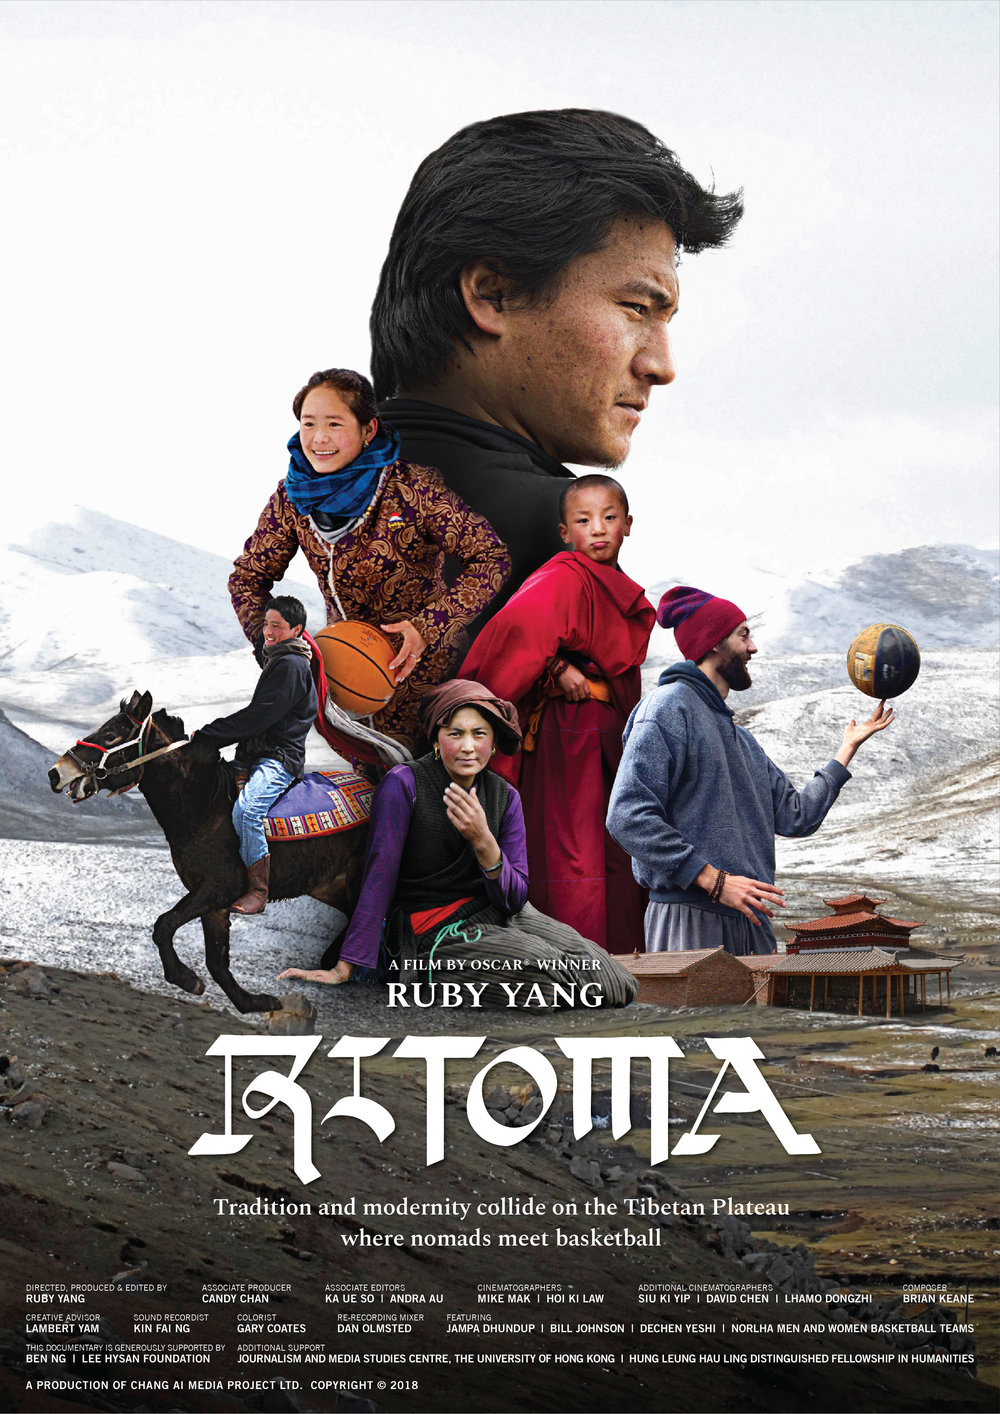 Dir: Ruby Yang